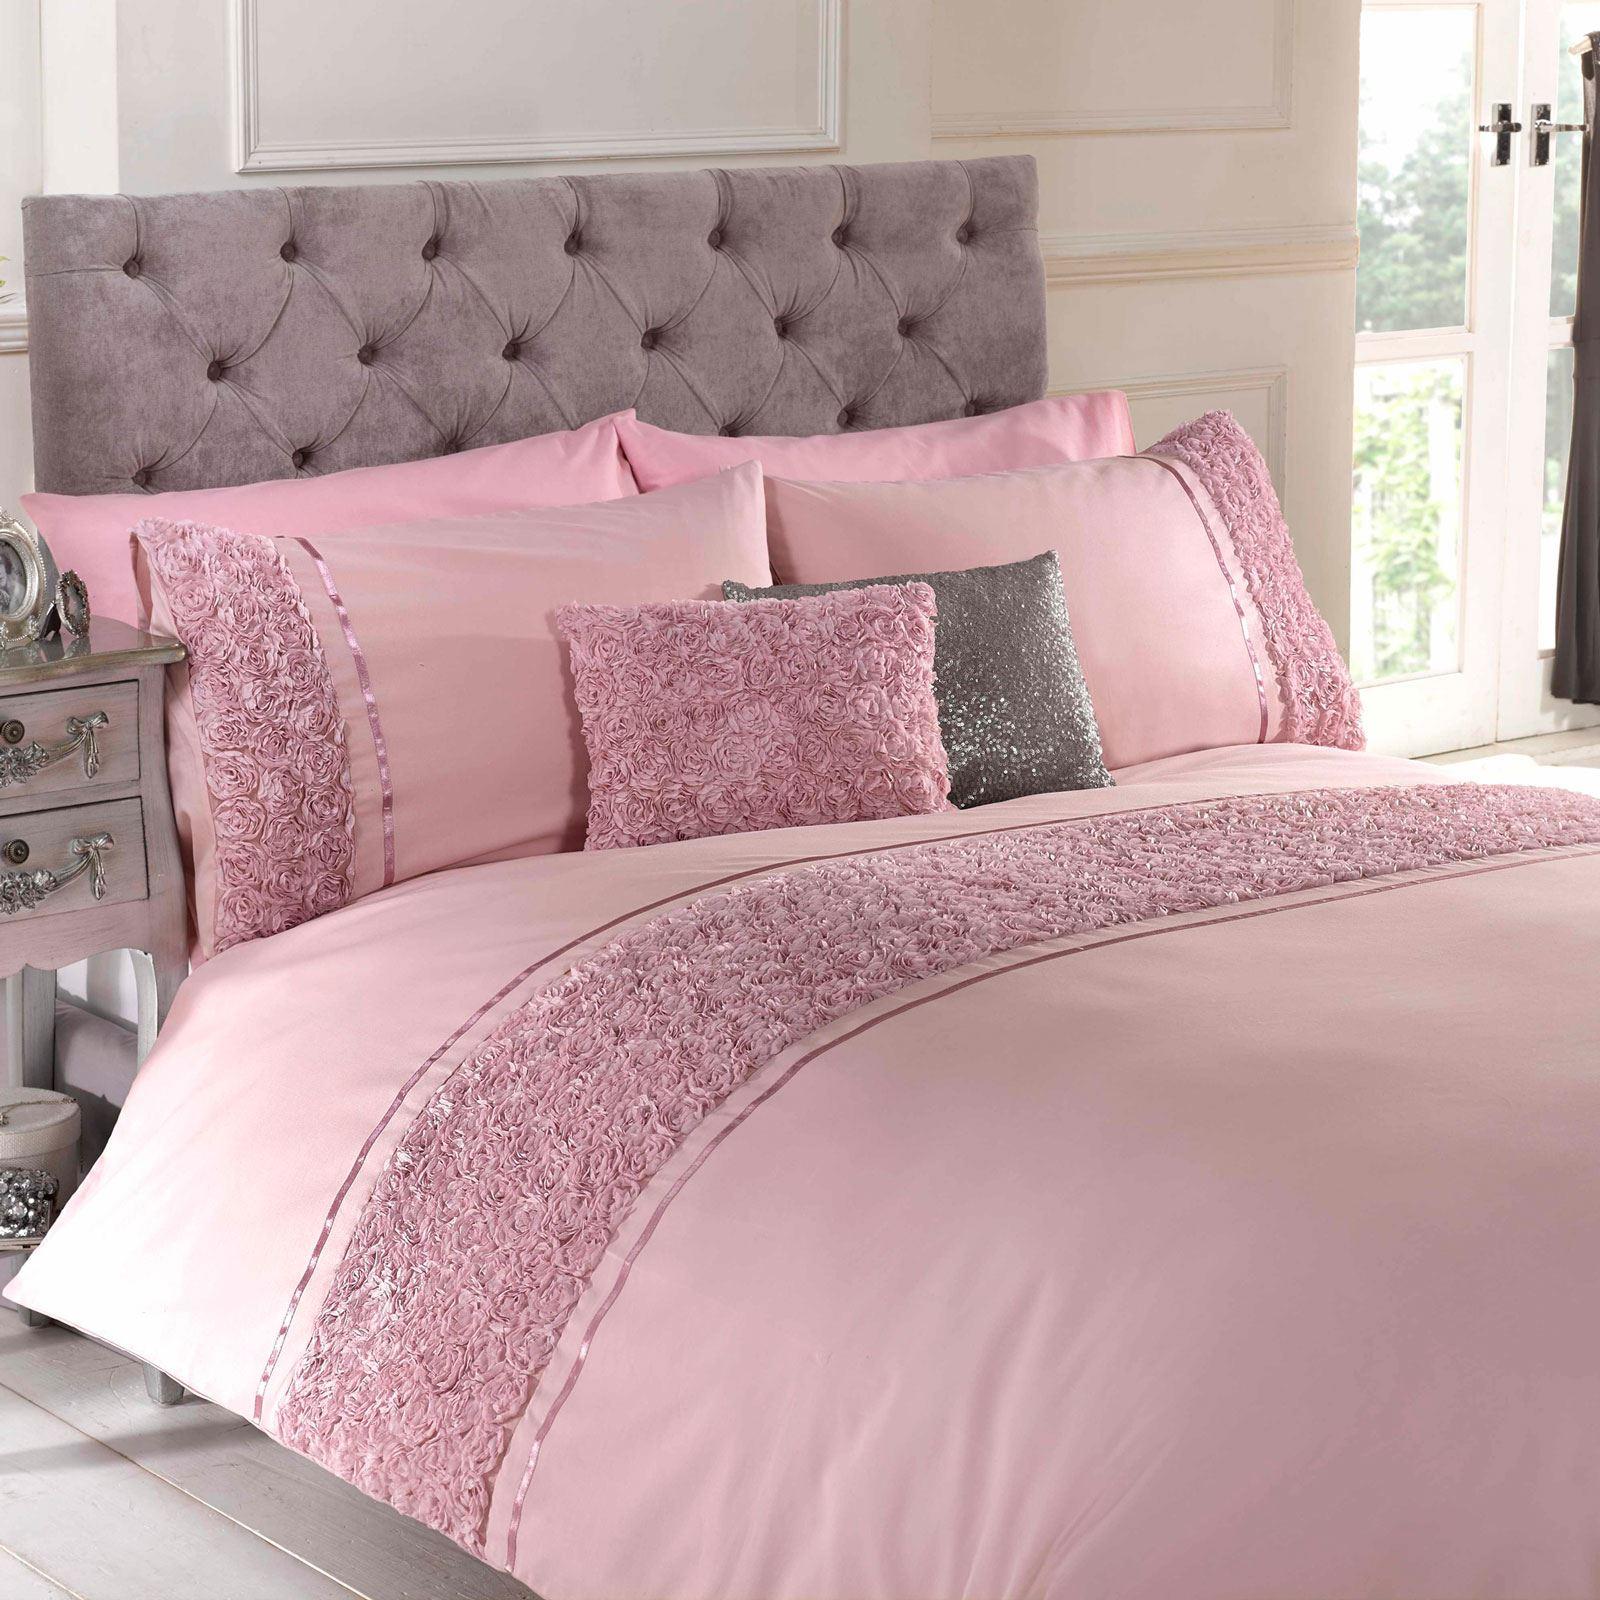 Limoges Rose Ruffle Blush Pink King Size Duvet Cover Set